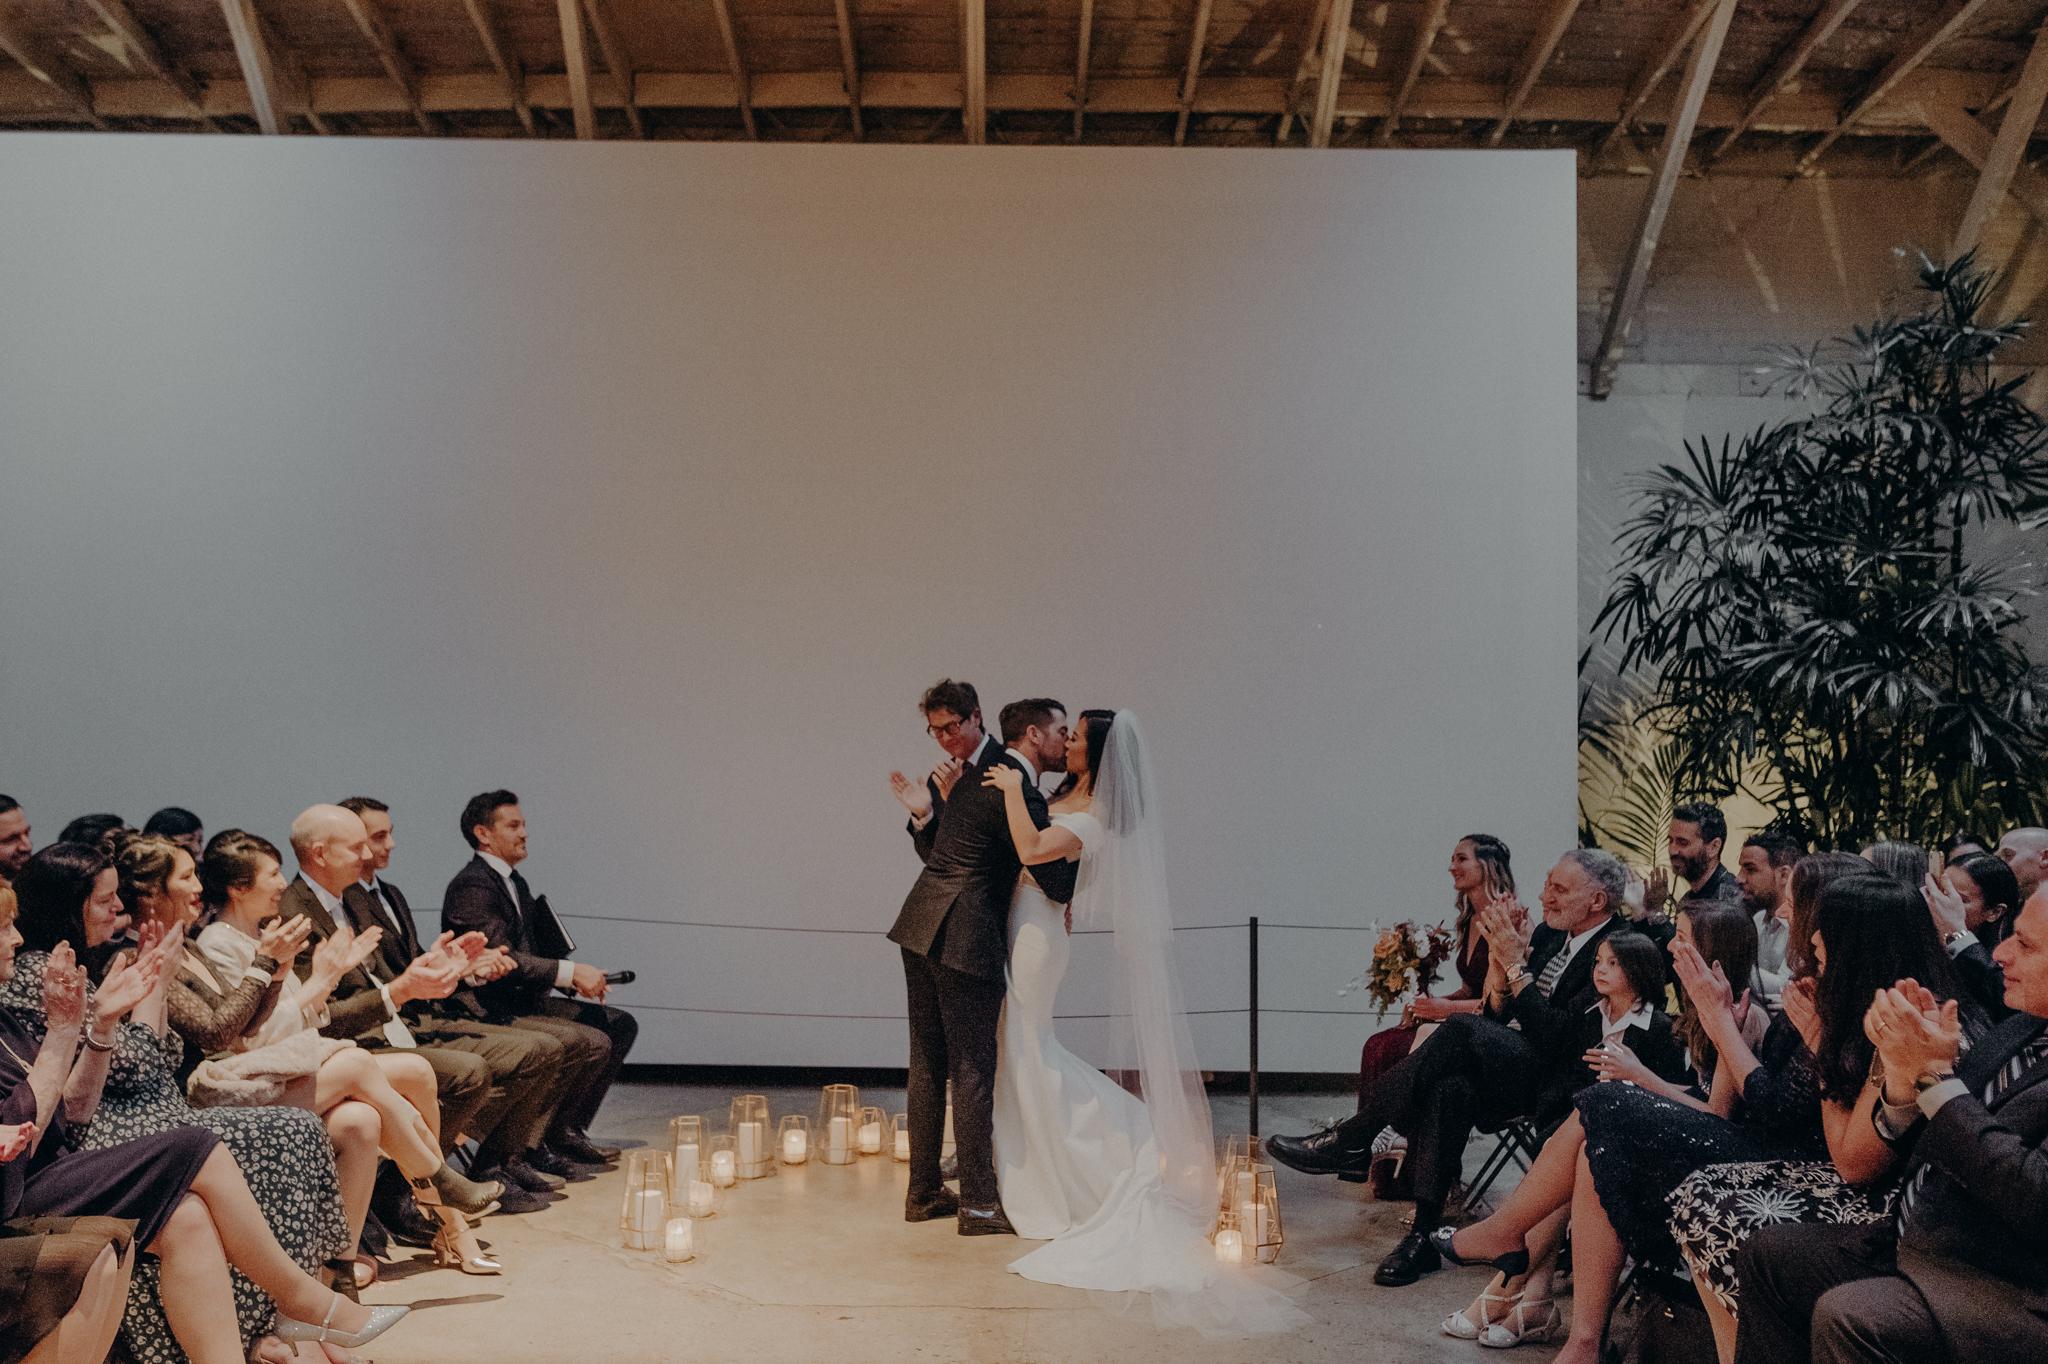 Wedding Photo LA - wedding photographer in los angeles - millwick wedding venue -isaiahandtaylor.com-100.jpg